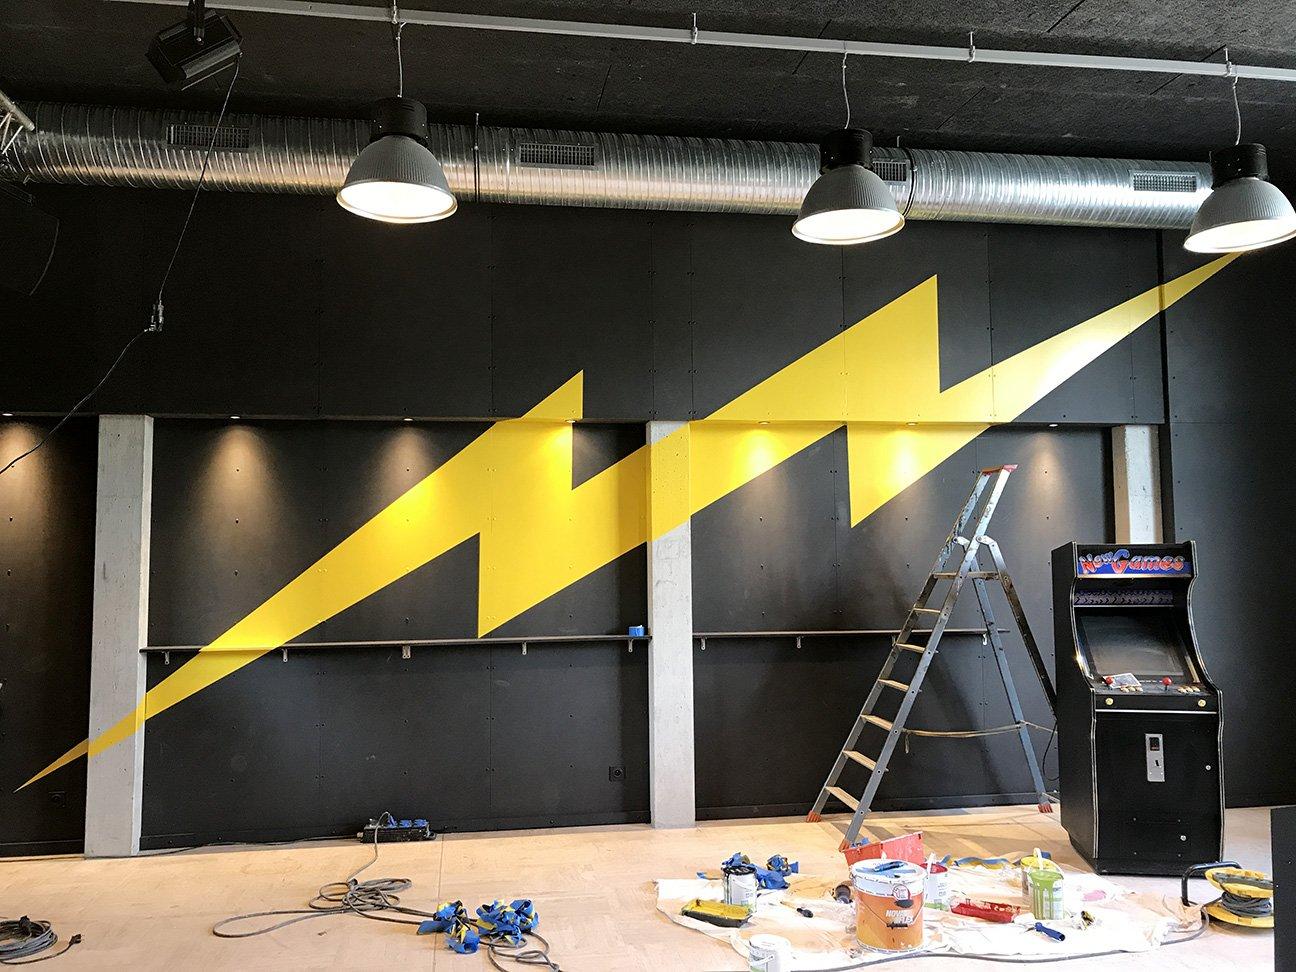 Fabien_cuffel_LePoulpe_Resto_Bar_Concert_Wall_Painting_lightning